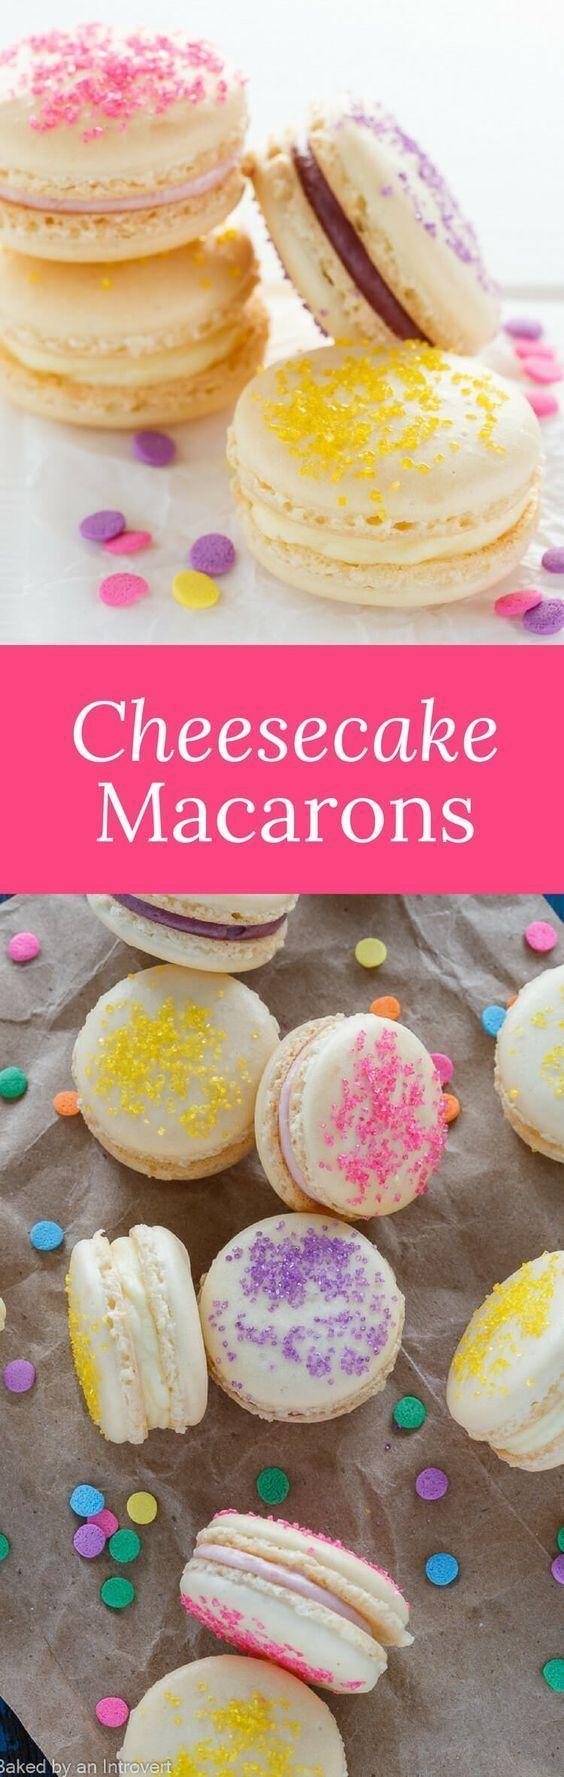 cheesecake macaroons